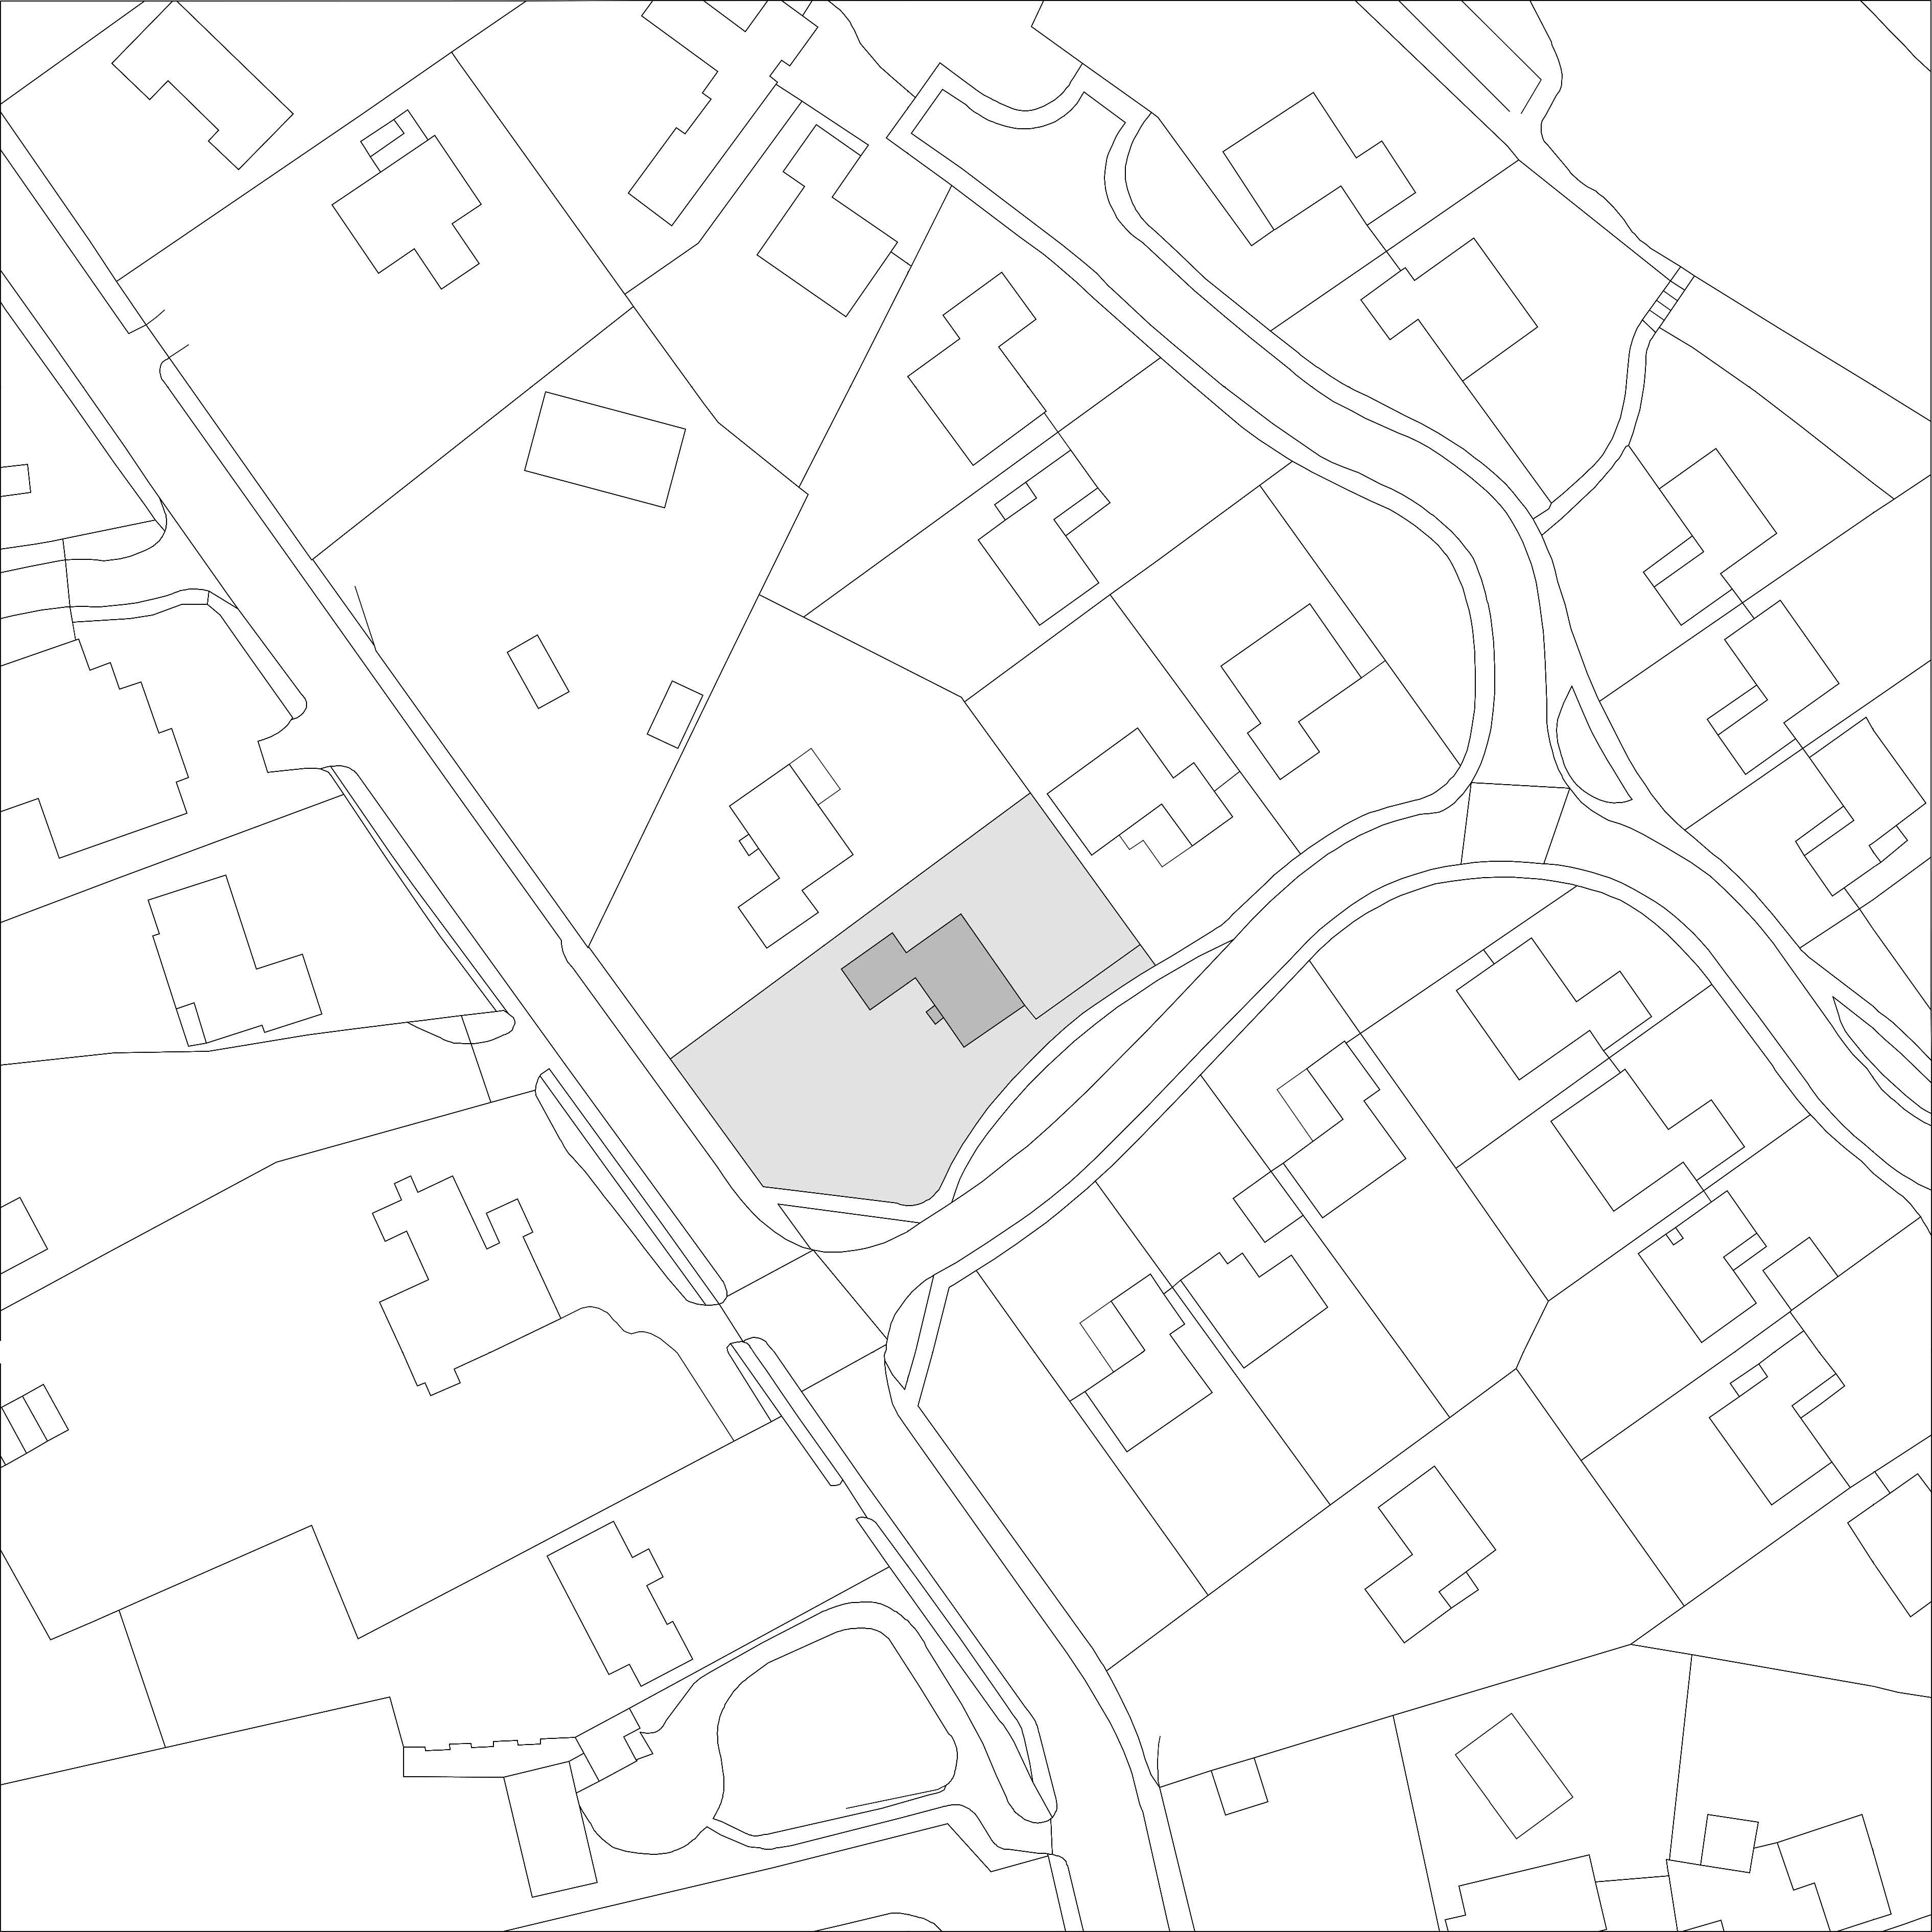 mark-way-site-plan